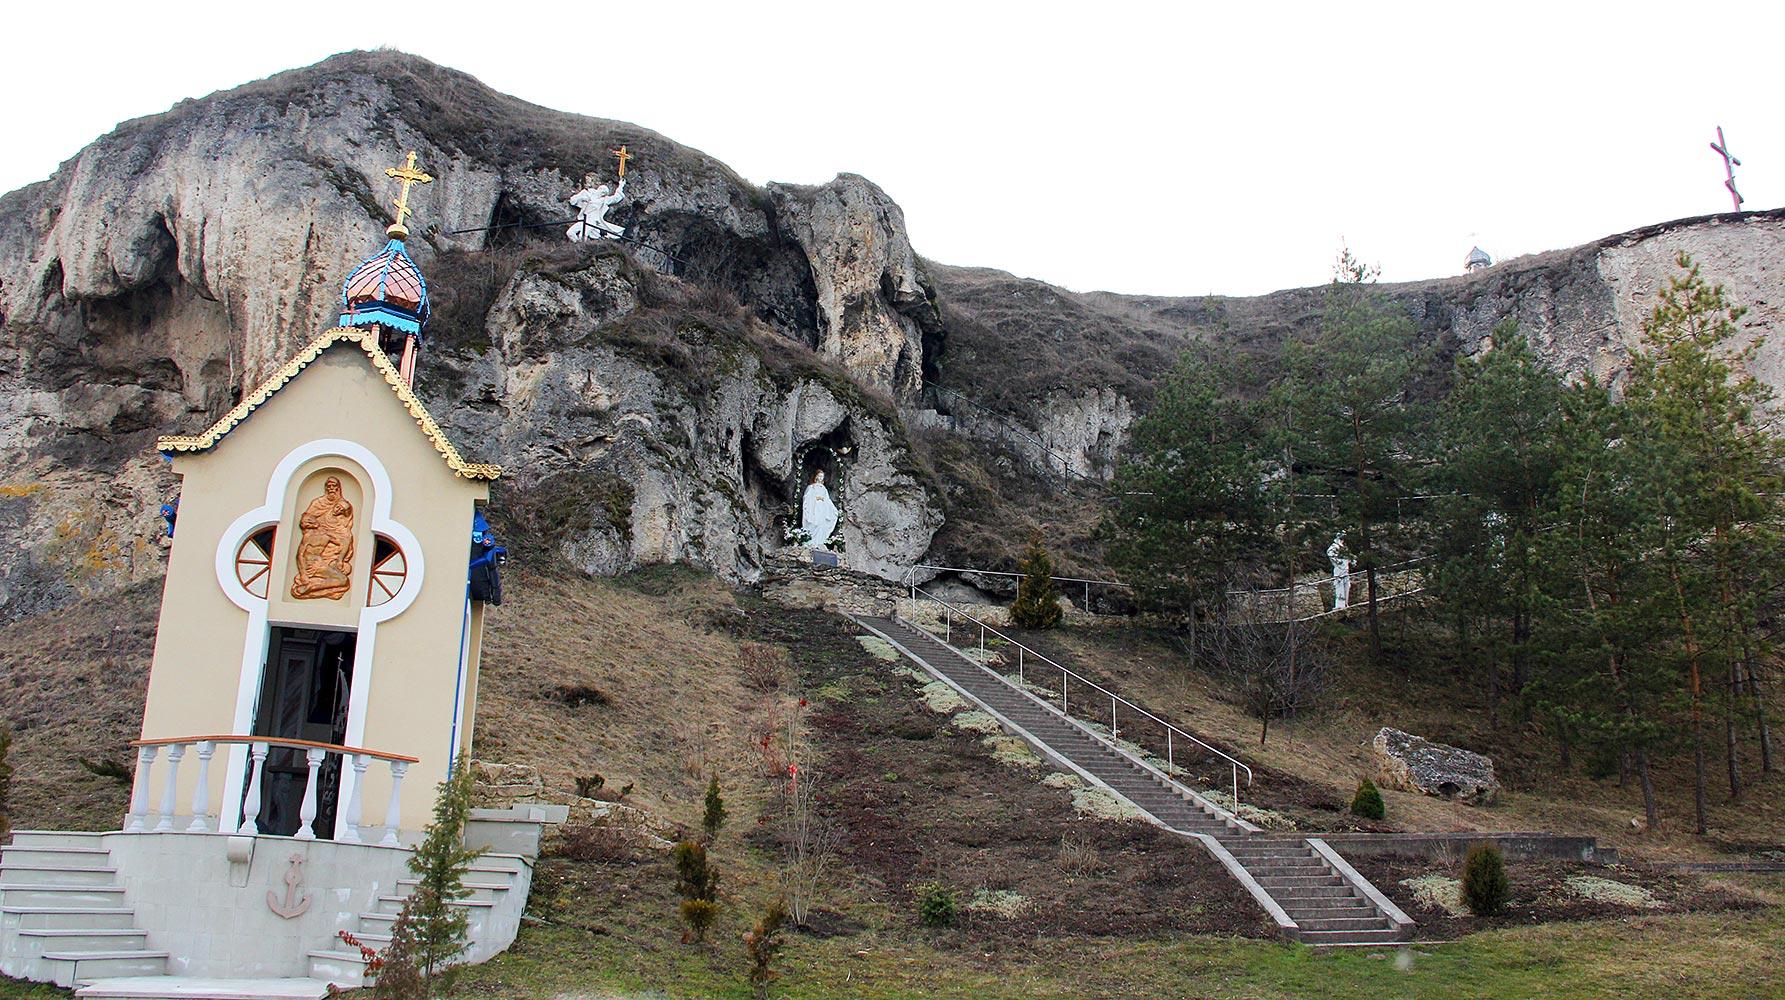 1497262805593e6ad594a7f - Бучач, Коропец + Русиловськие водопады